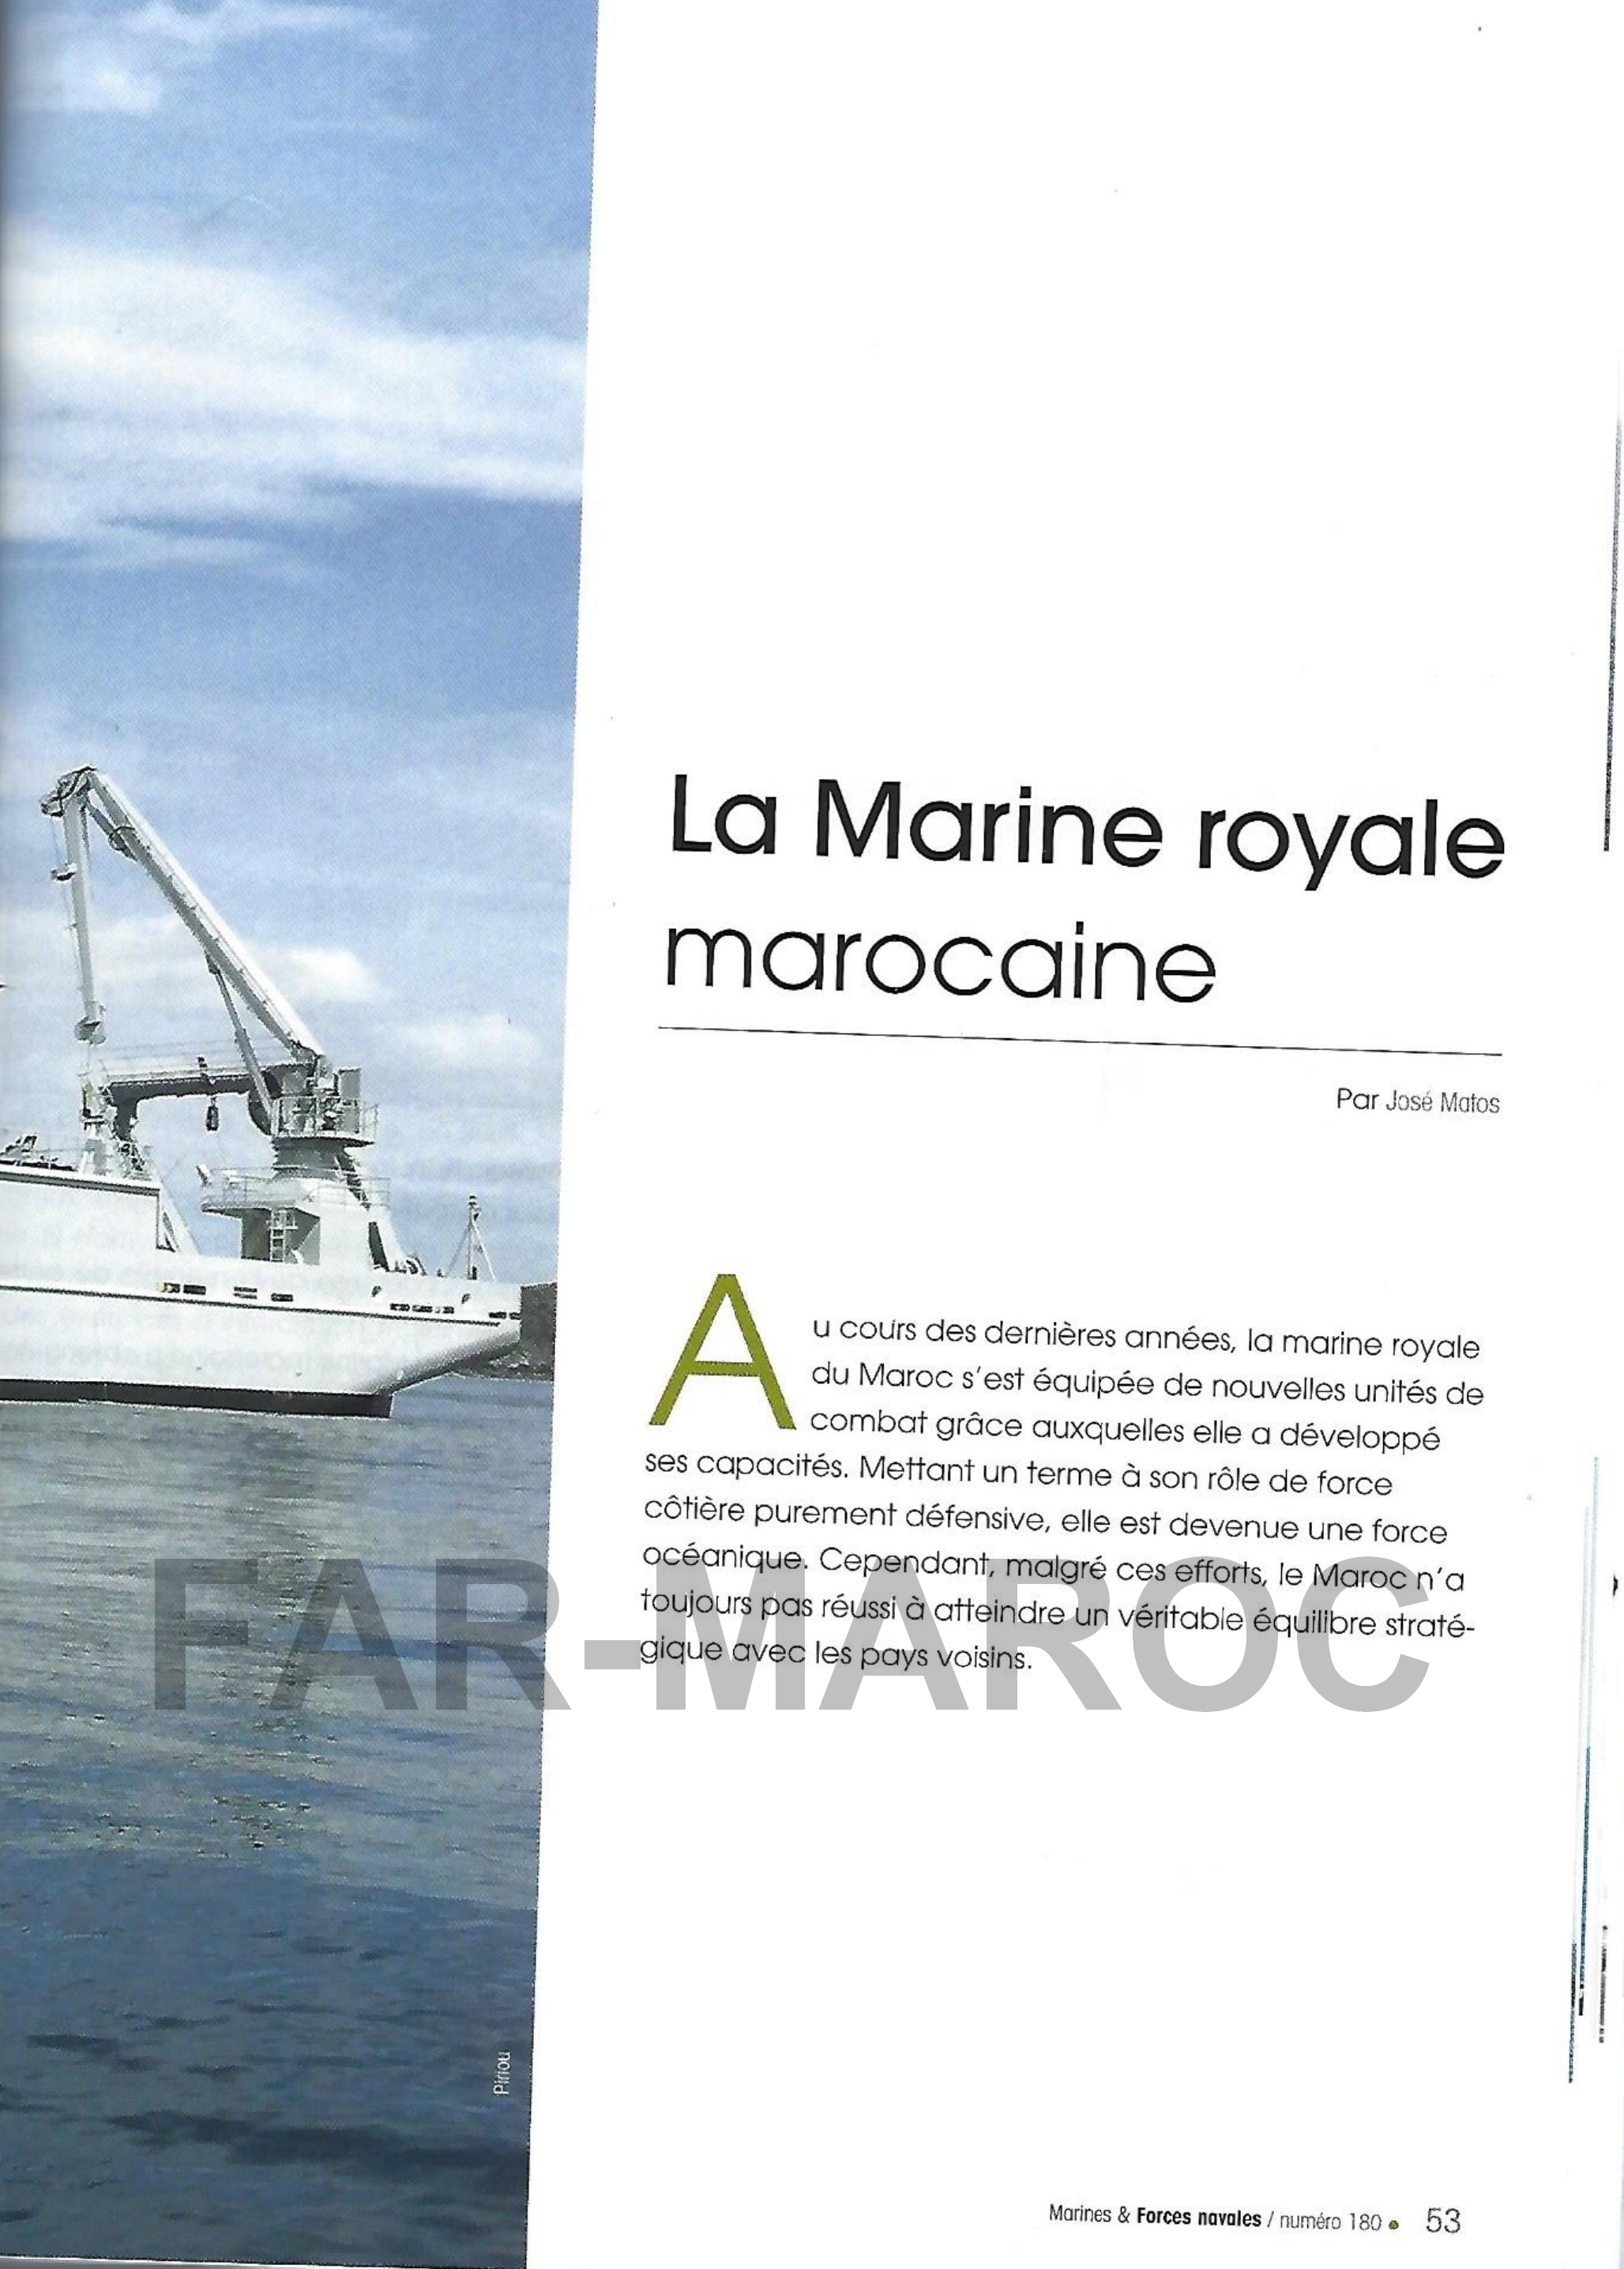 Articles à propos de la Marine Royale Marocaine 46682827215_42497cf0ed_o